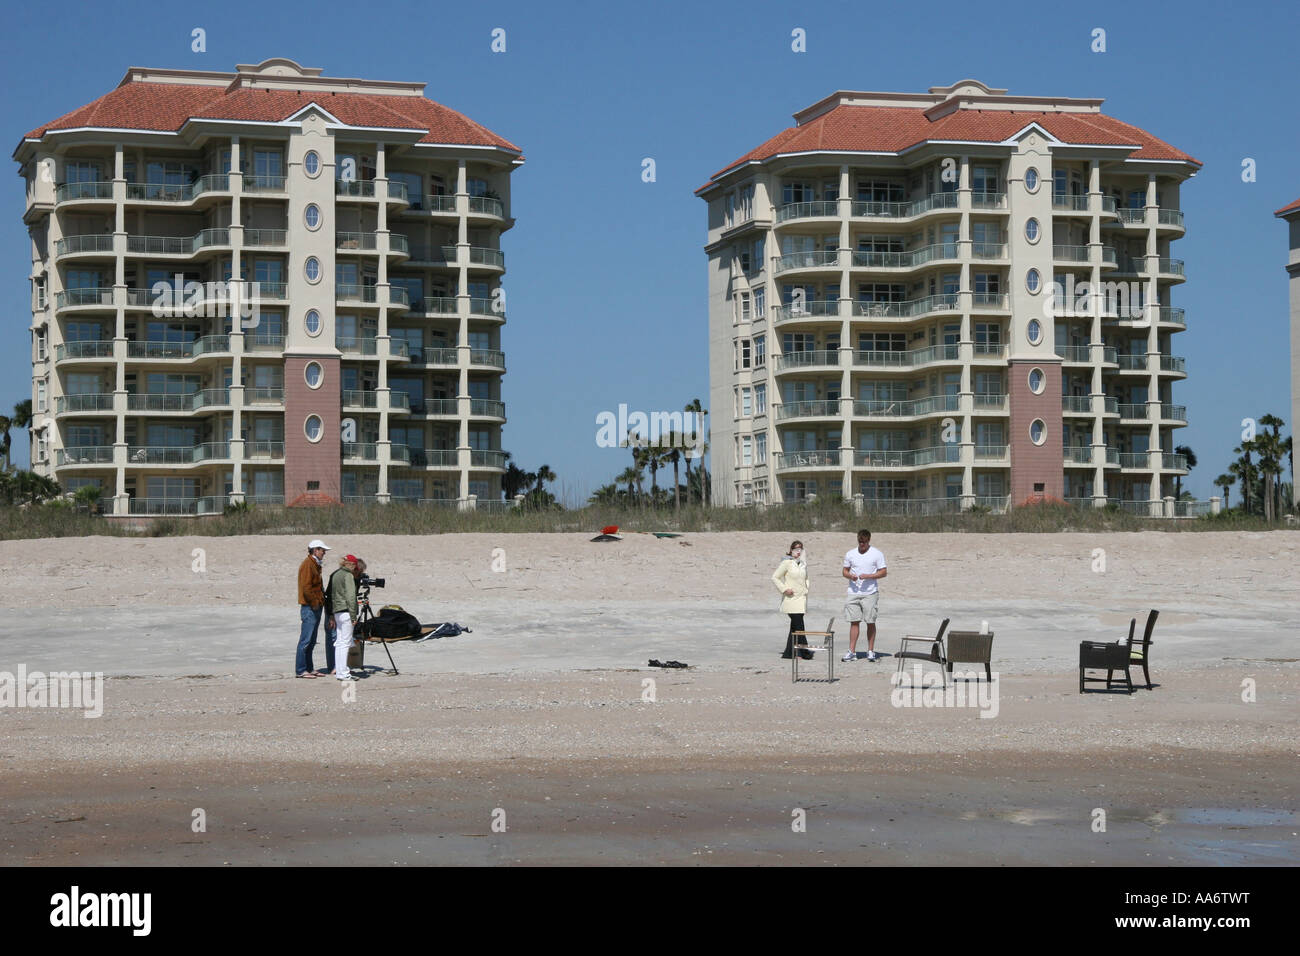 Photo shoot on the beach Stock Photo